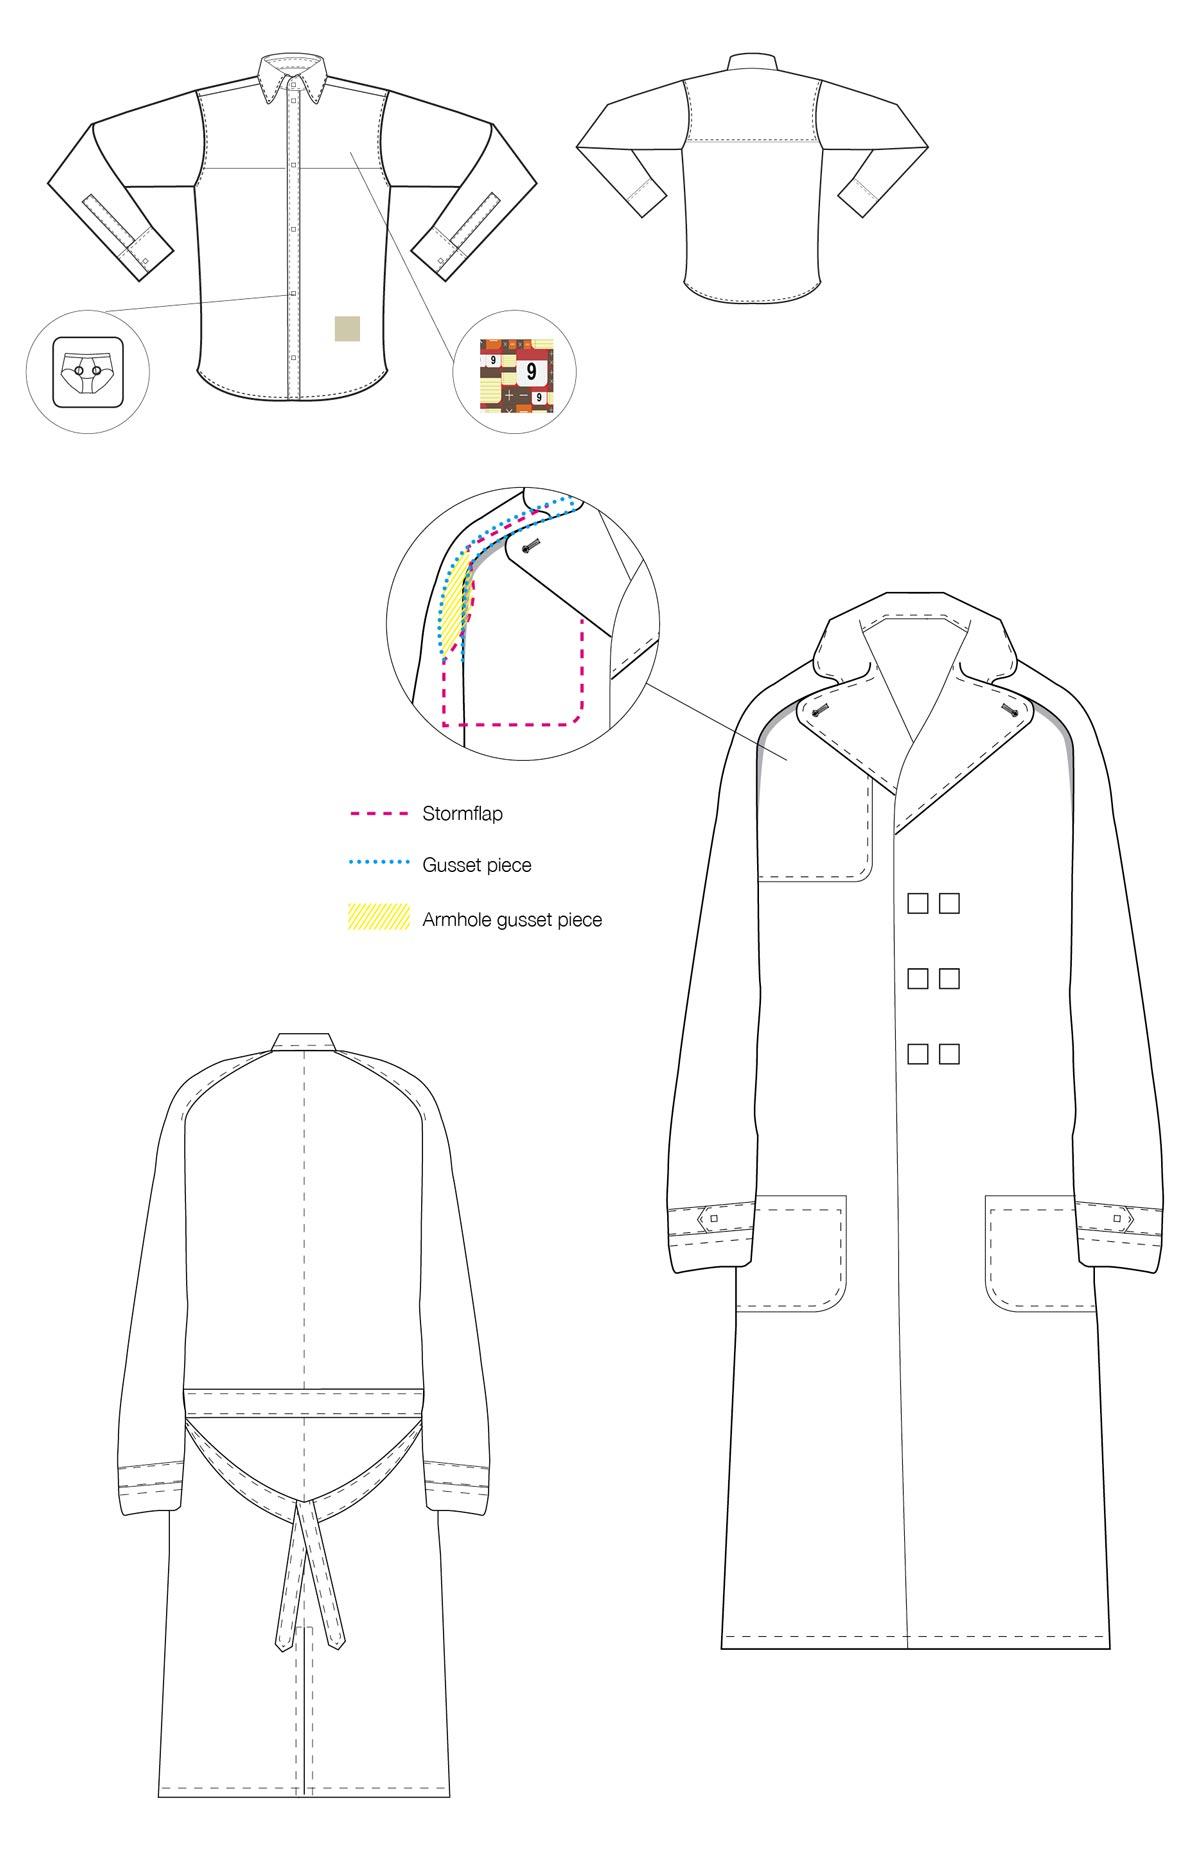 maria michael onnerboegs fashion designer menswear jewelry necklace plexiglas acrylglas portfolio work rounded edges